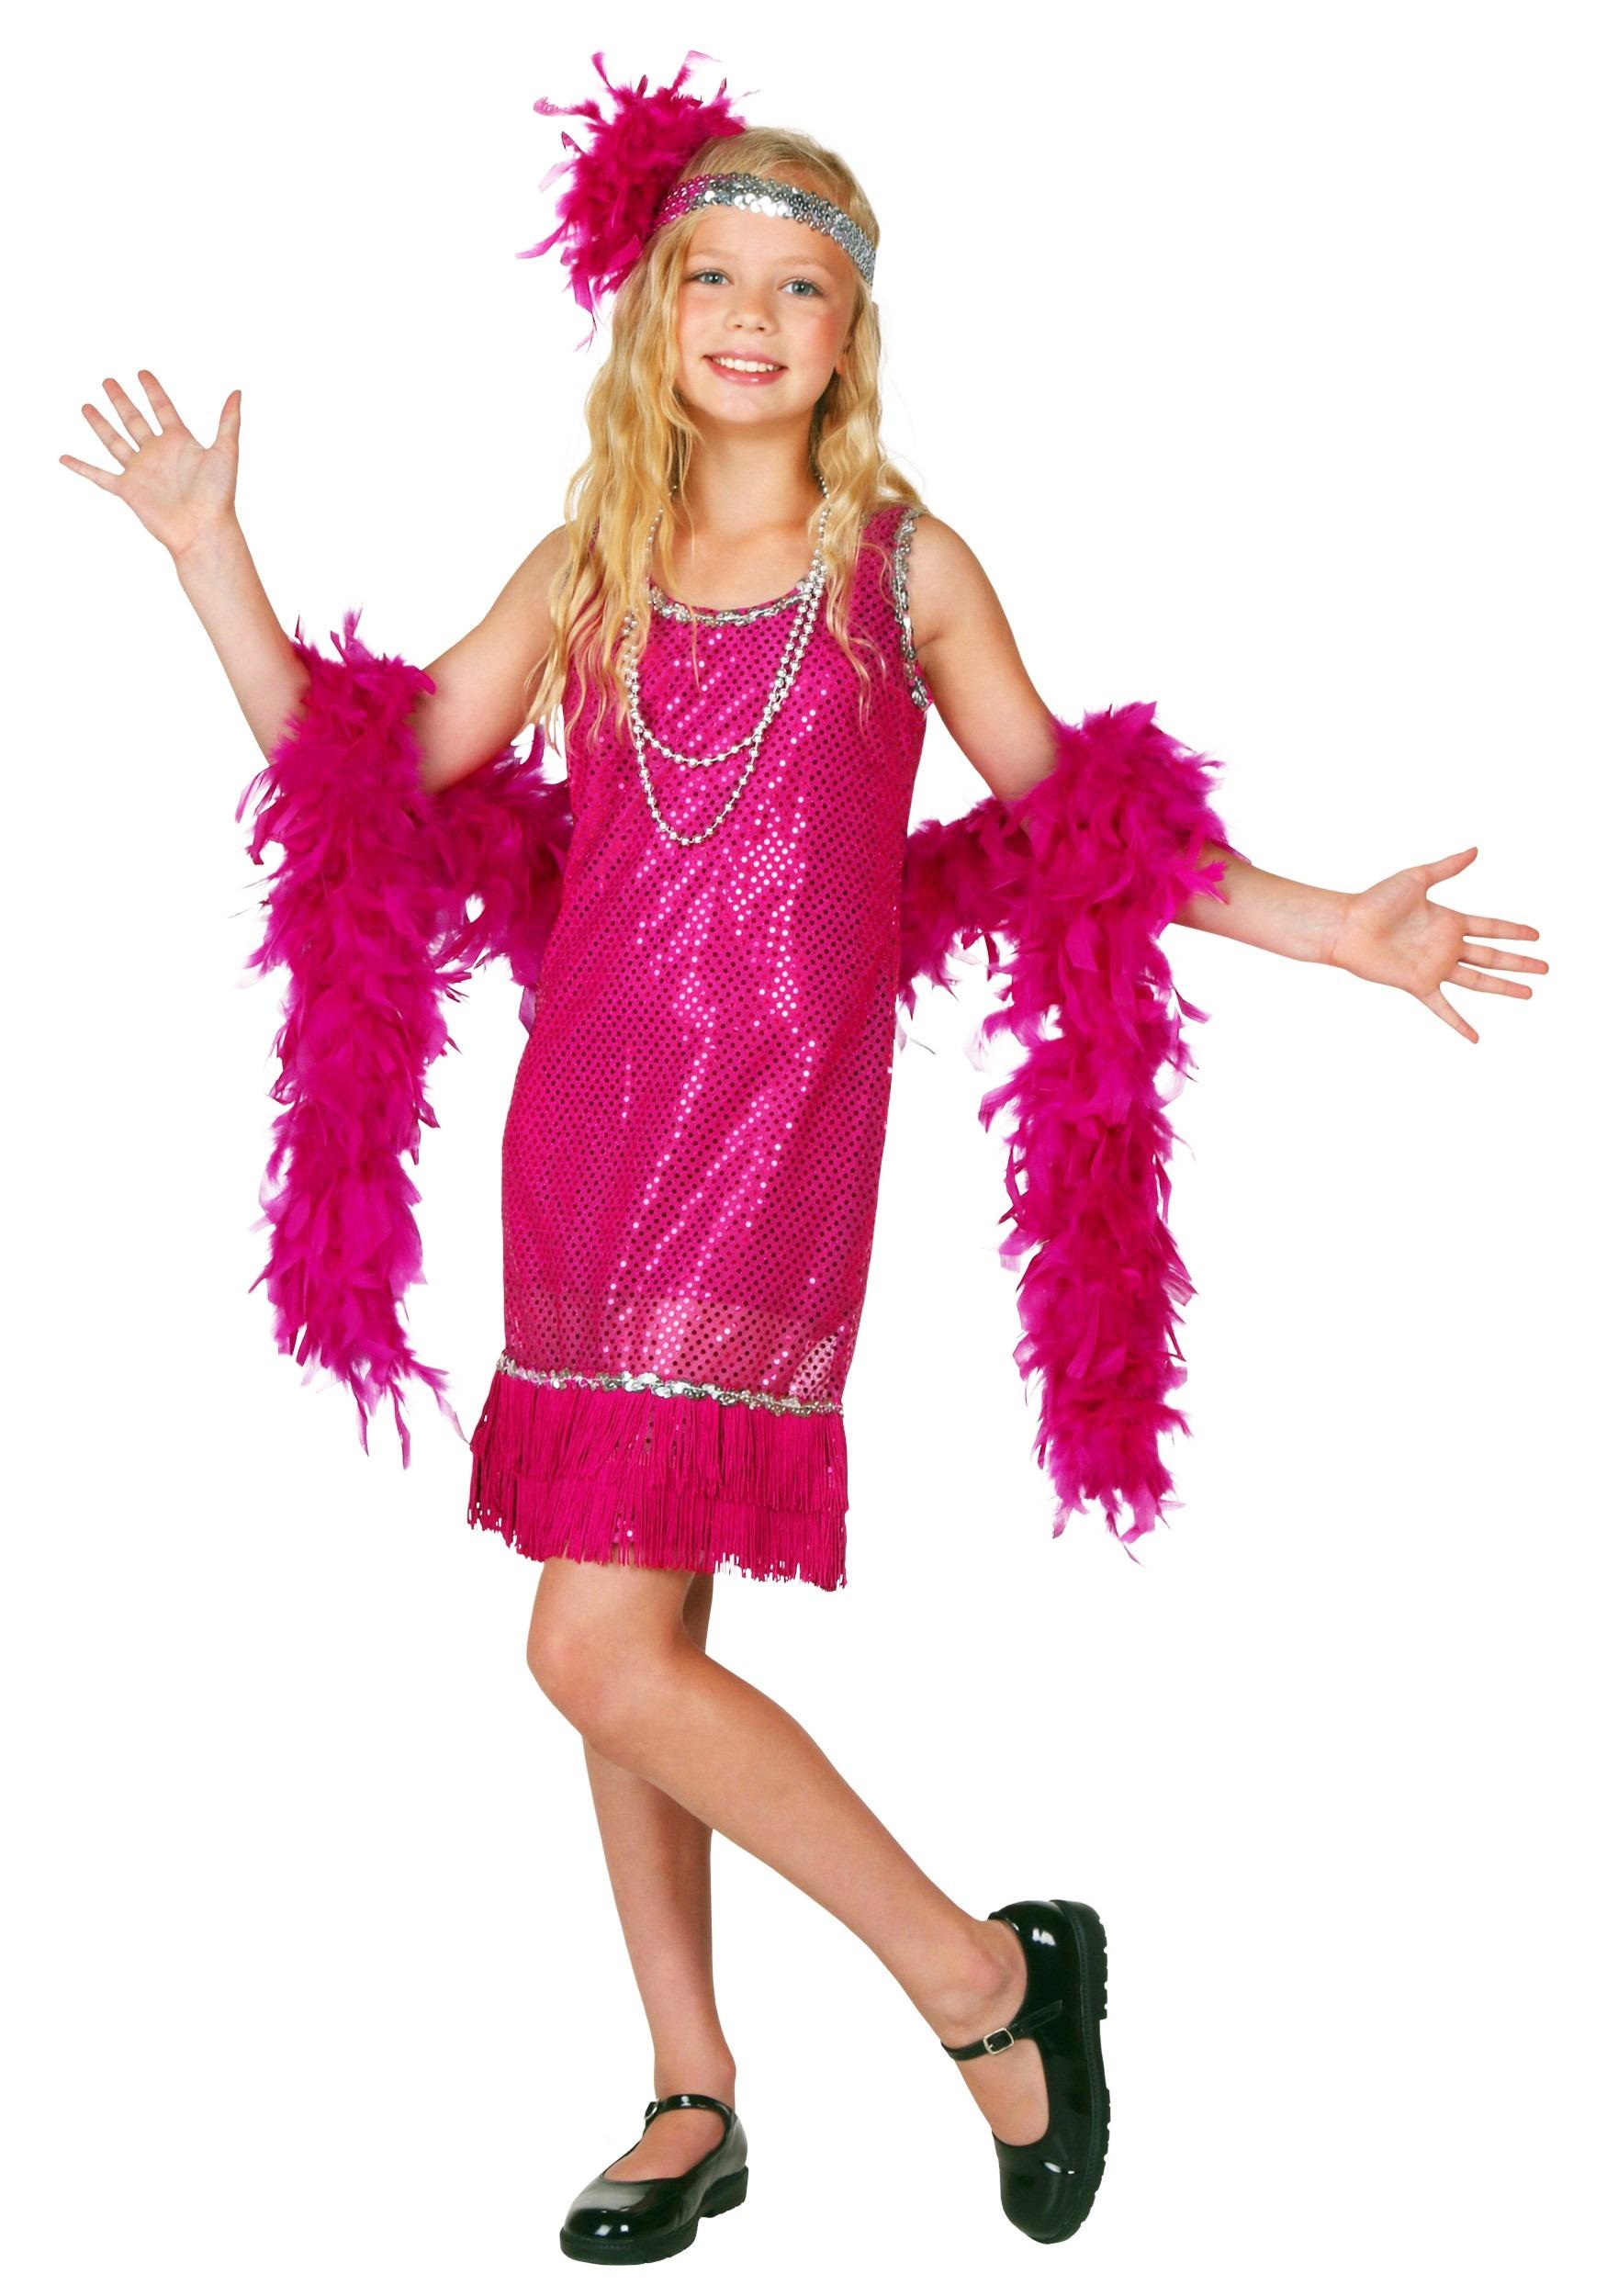 Living Fiction Studio Pop Star Pink Sequin Dress Halloween Costume Girls Sz 8-10